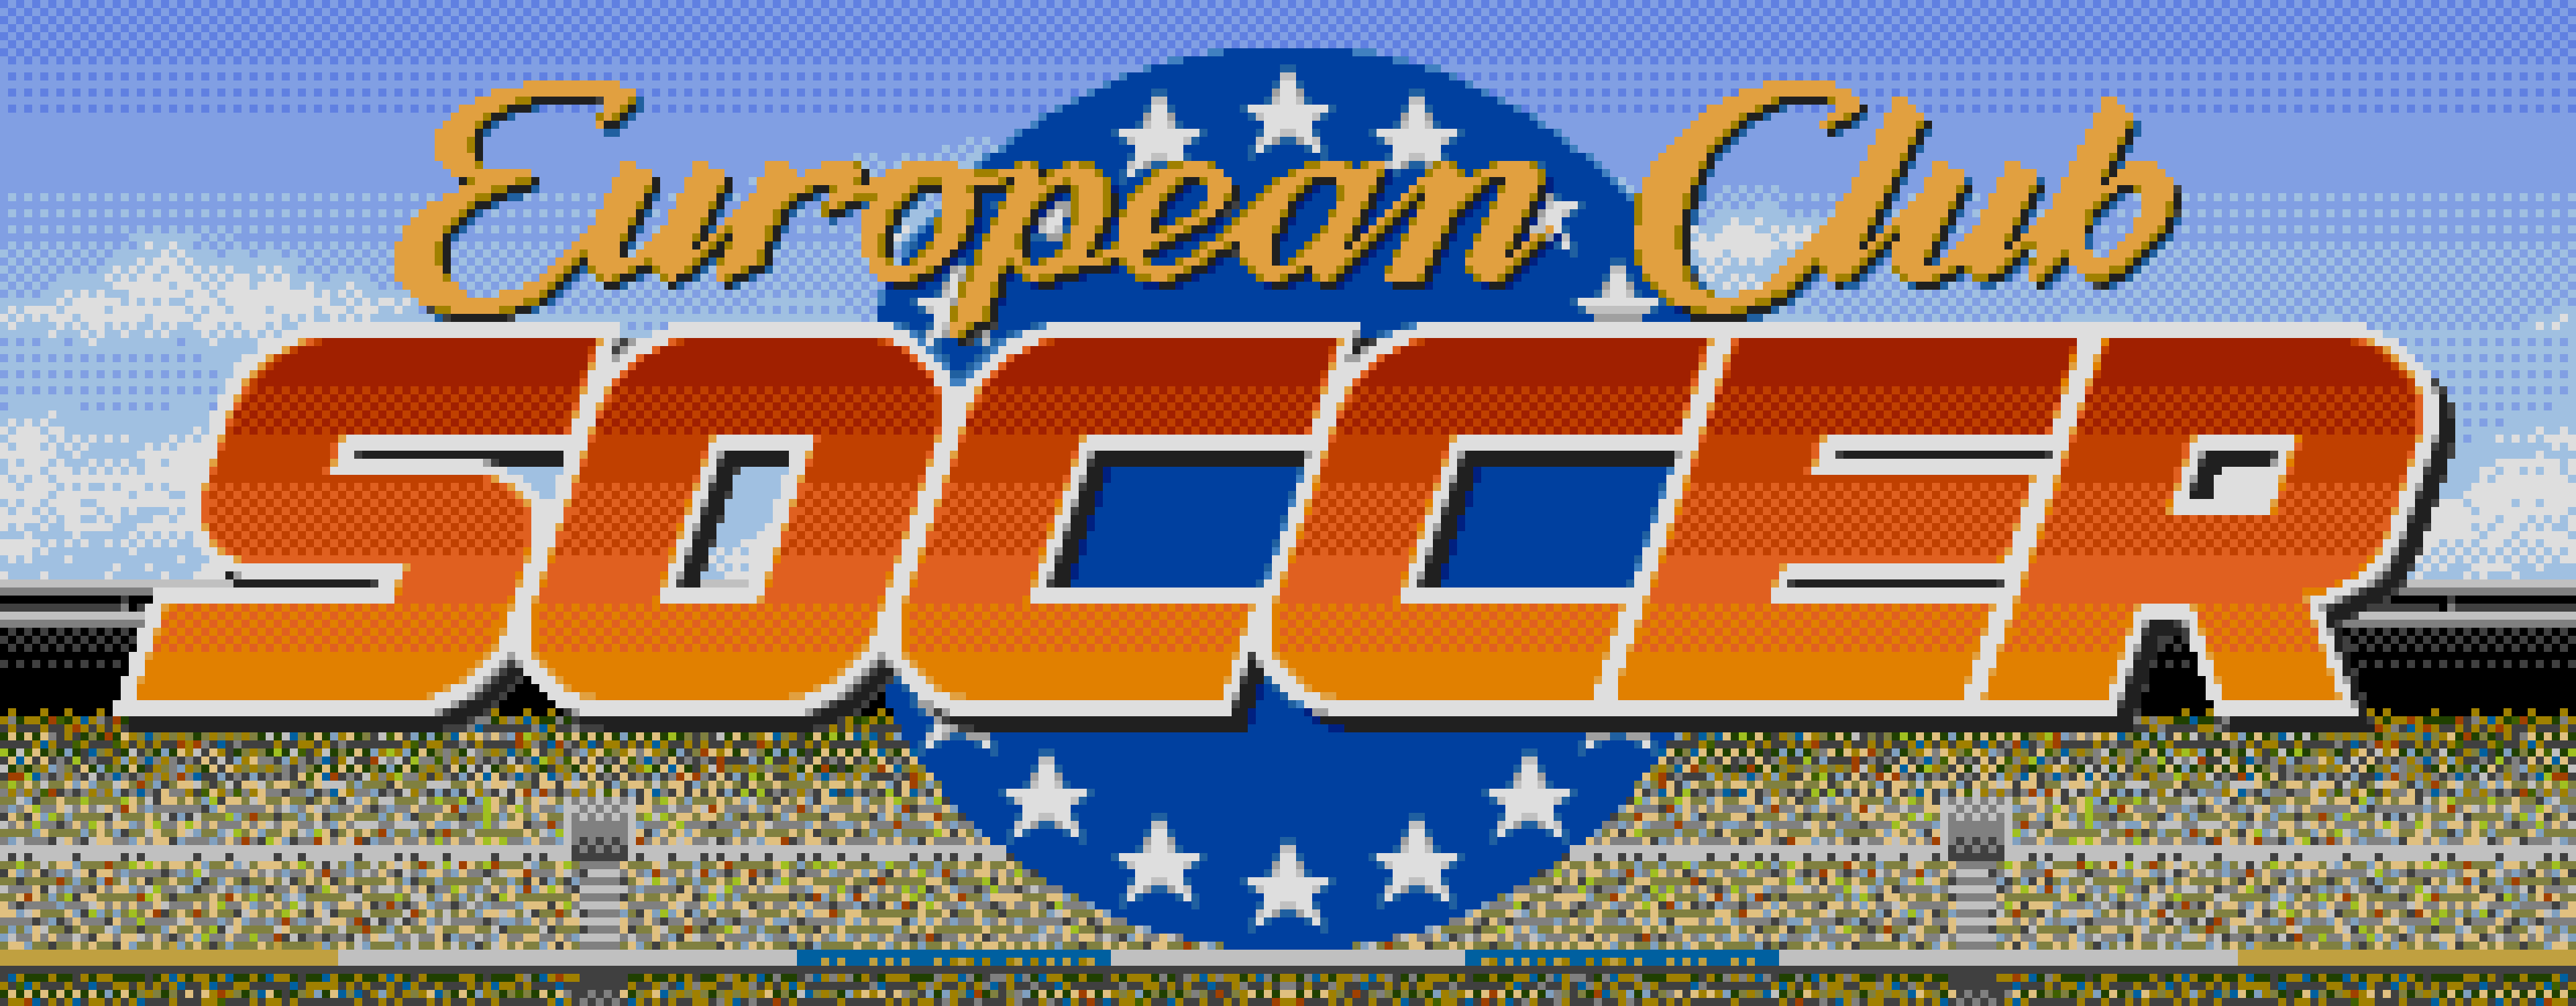 The title screen logo of European Club Soccer.